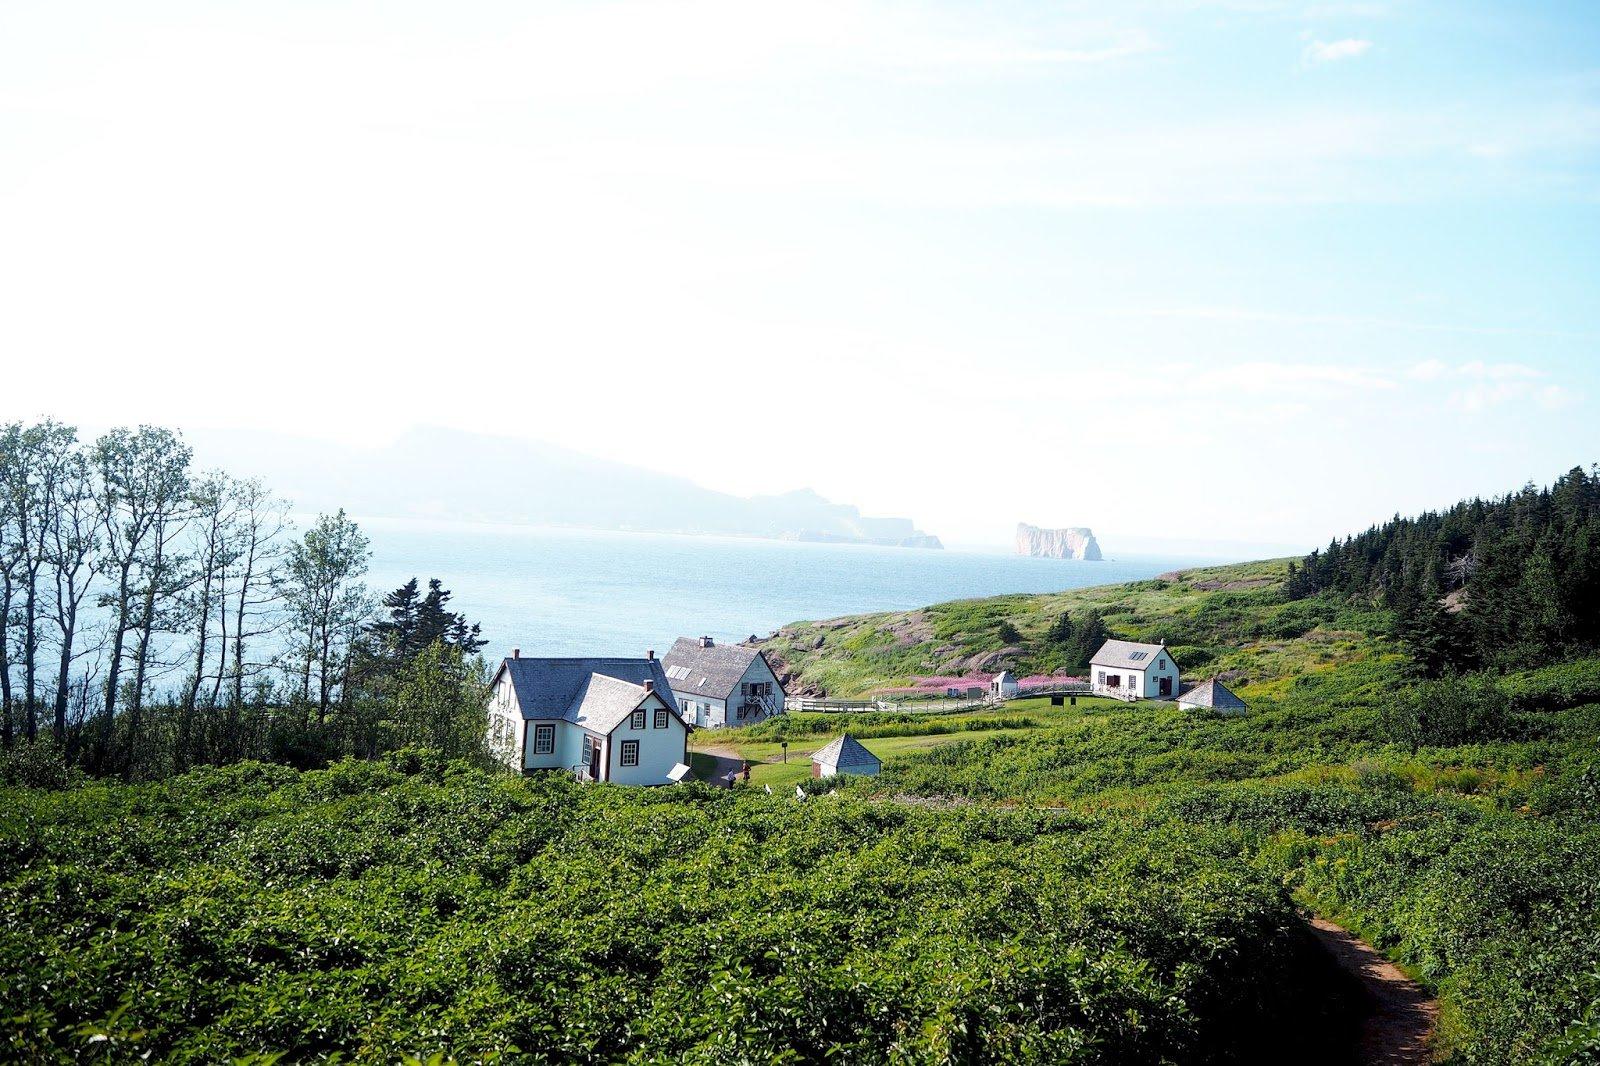 Gaspésie île Bonaventure